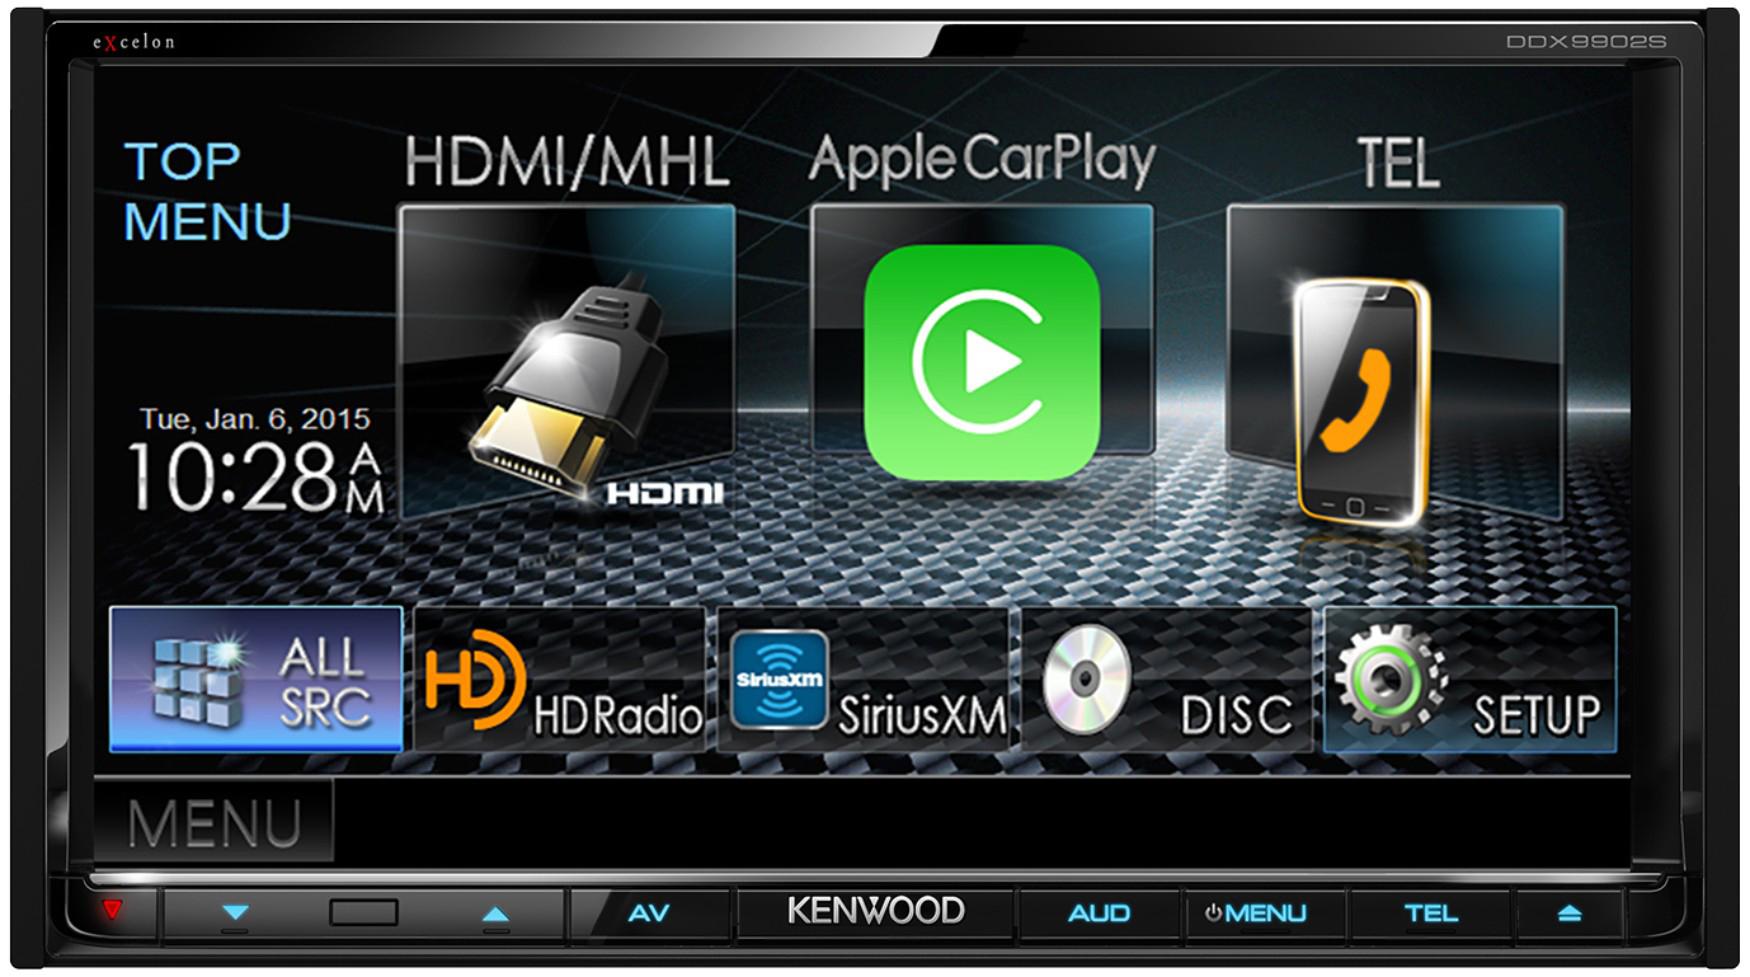 Kenwood CarPlay